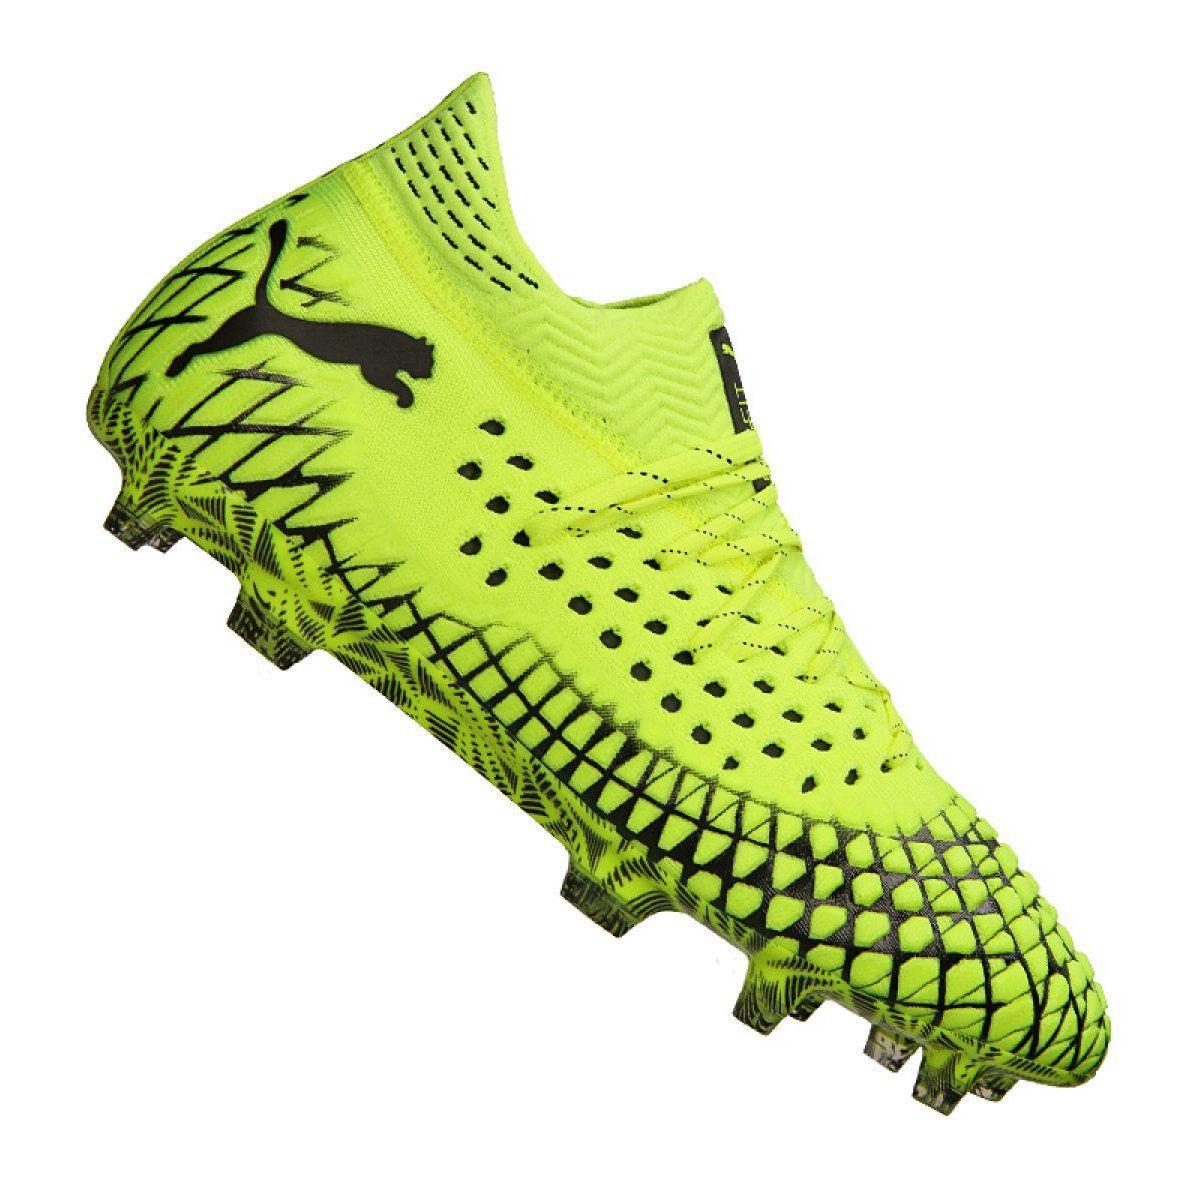 Buty Do Pilki Noznej Puma Future 4 1 Netfit Fg Ag M 105579 03 Zolte Zolte Football Boots Designer Boots Shoe Laces